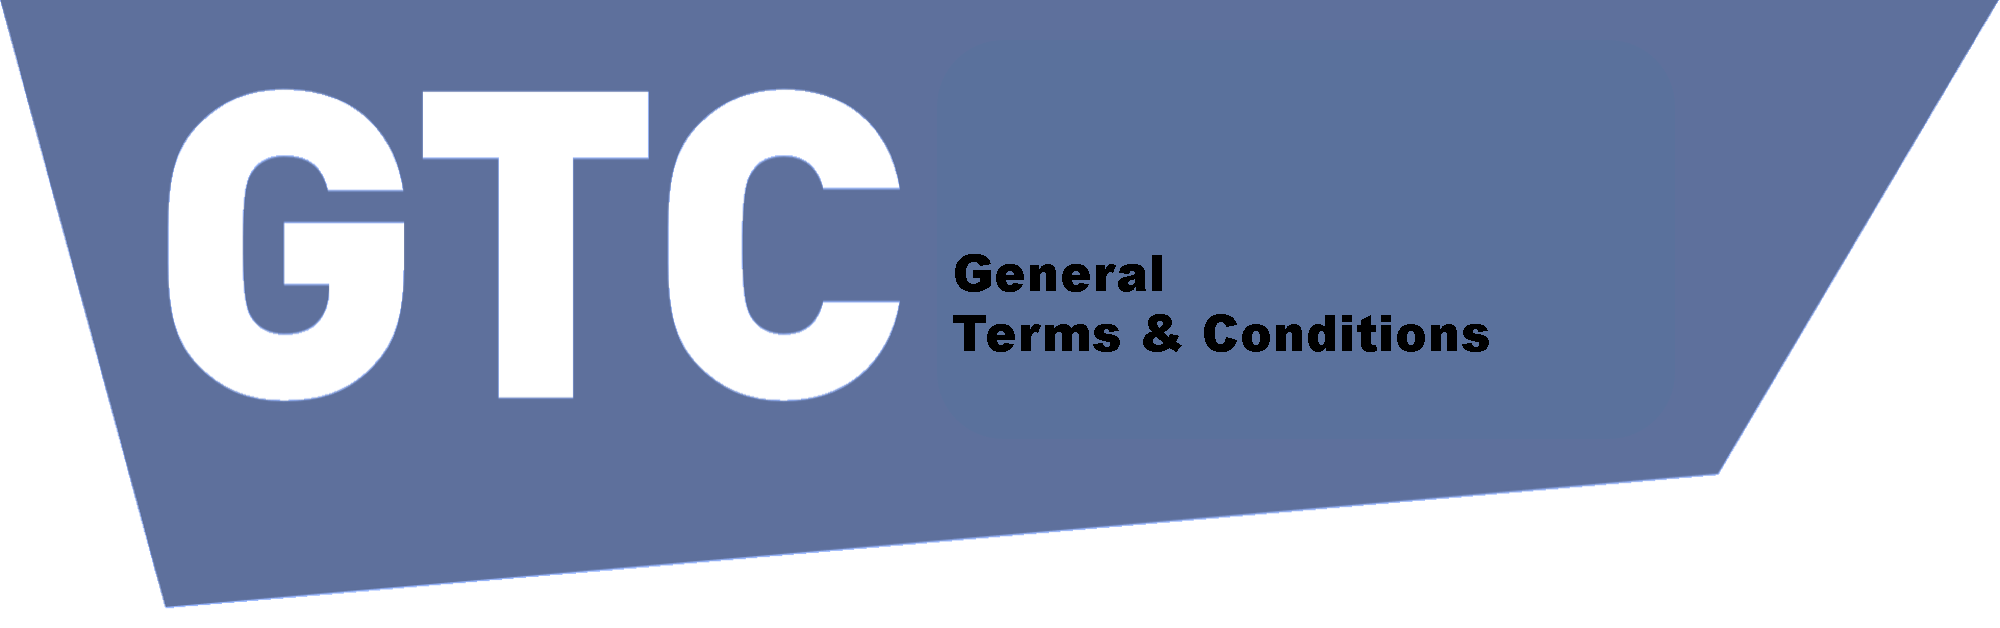 GTC-Iran contract bar